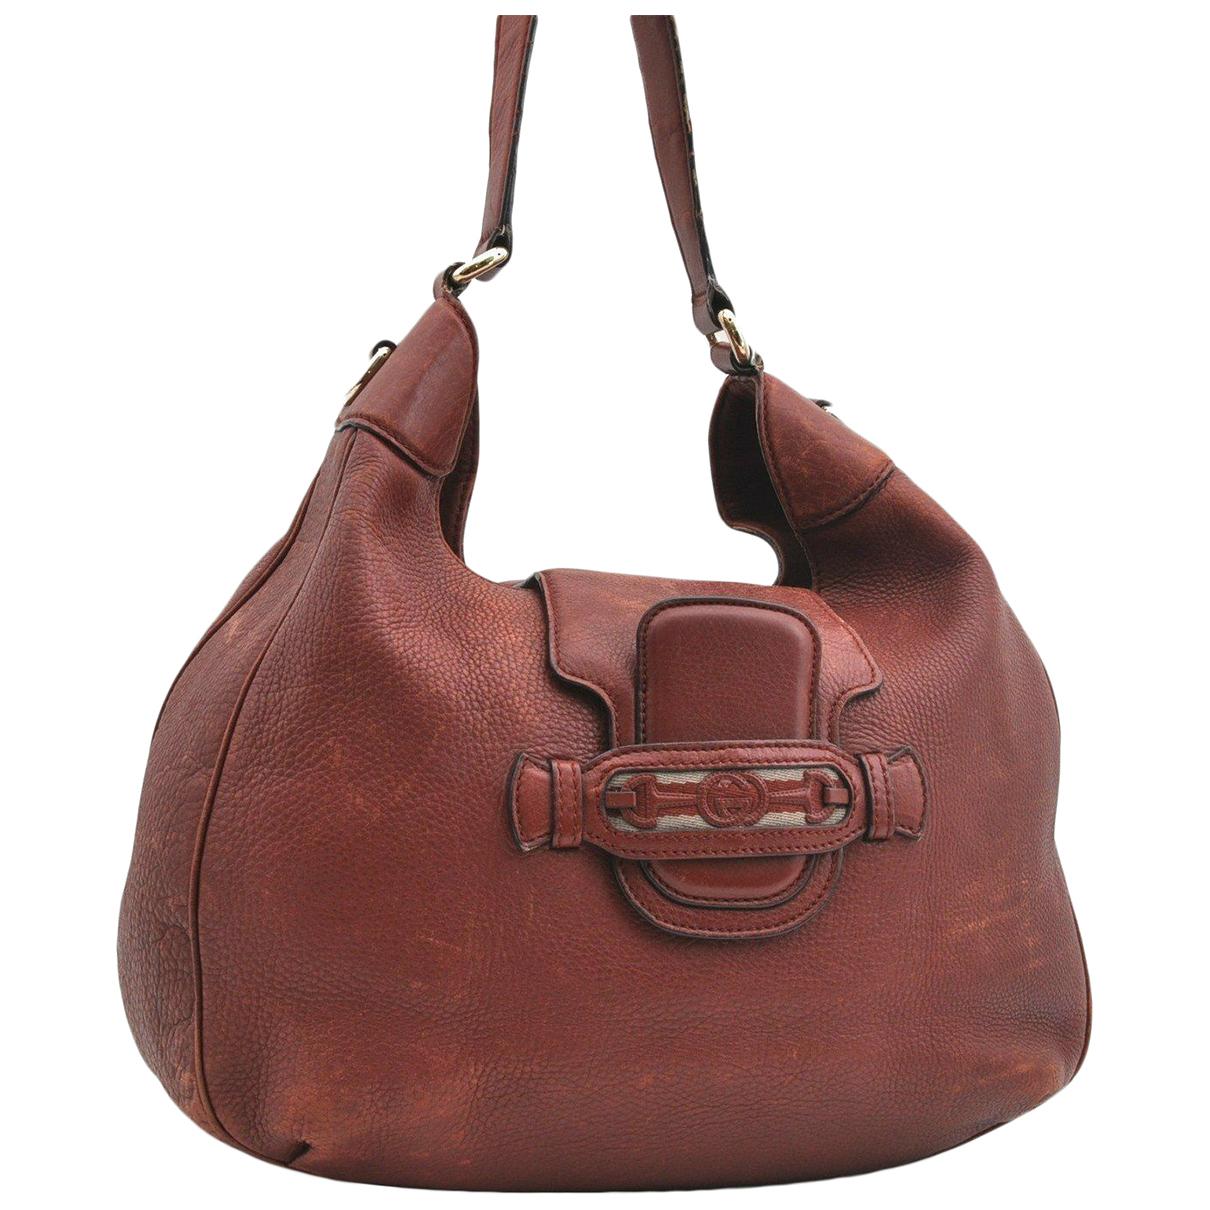 Gucci N Burgundy Leather handbag for Women N